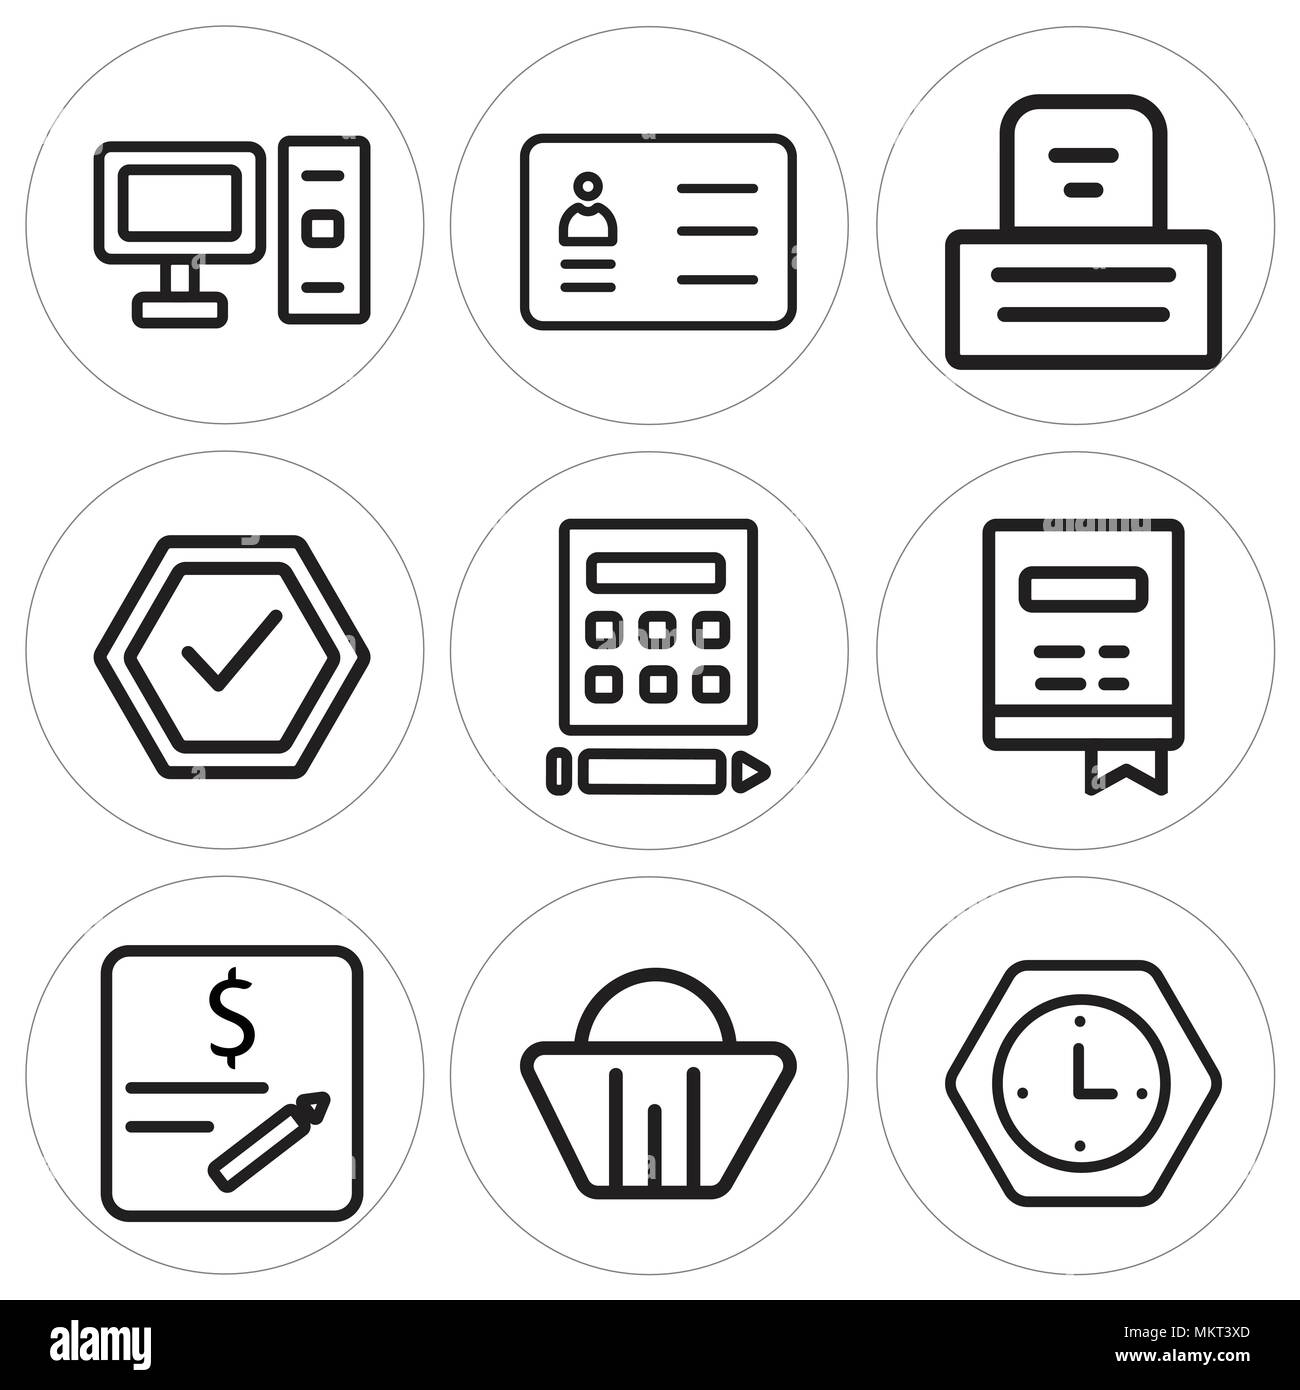 Resume Black White Icon Cv Black and White Stock Photos & Images - Alamy